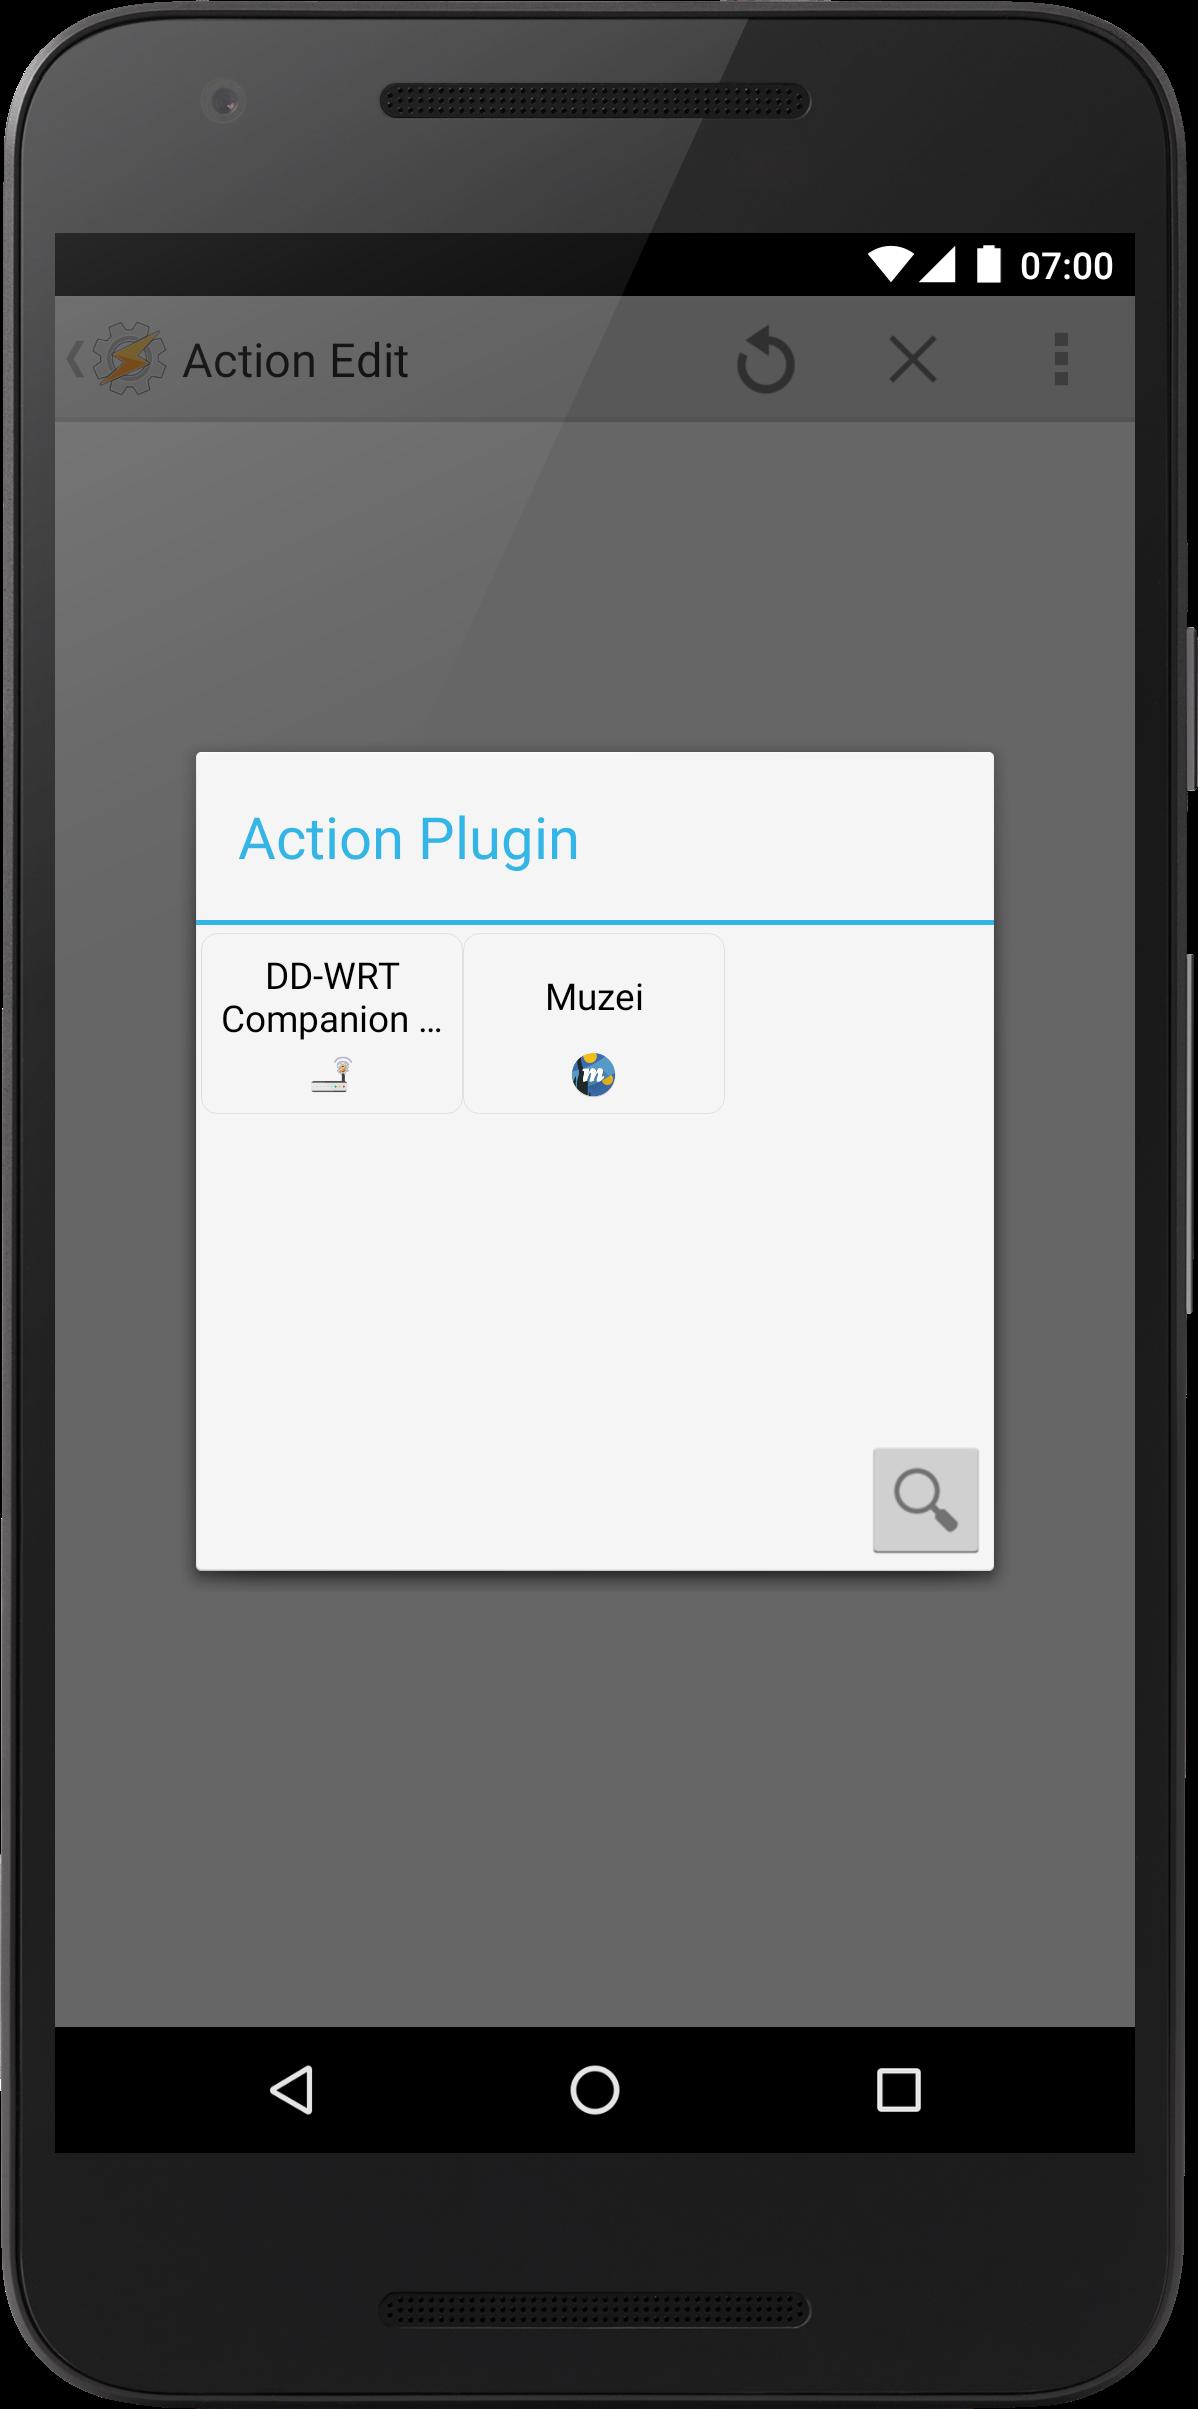 Click Plugins